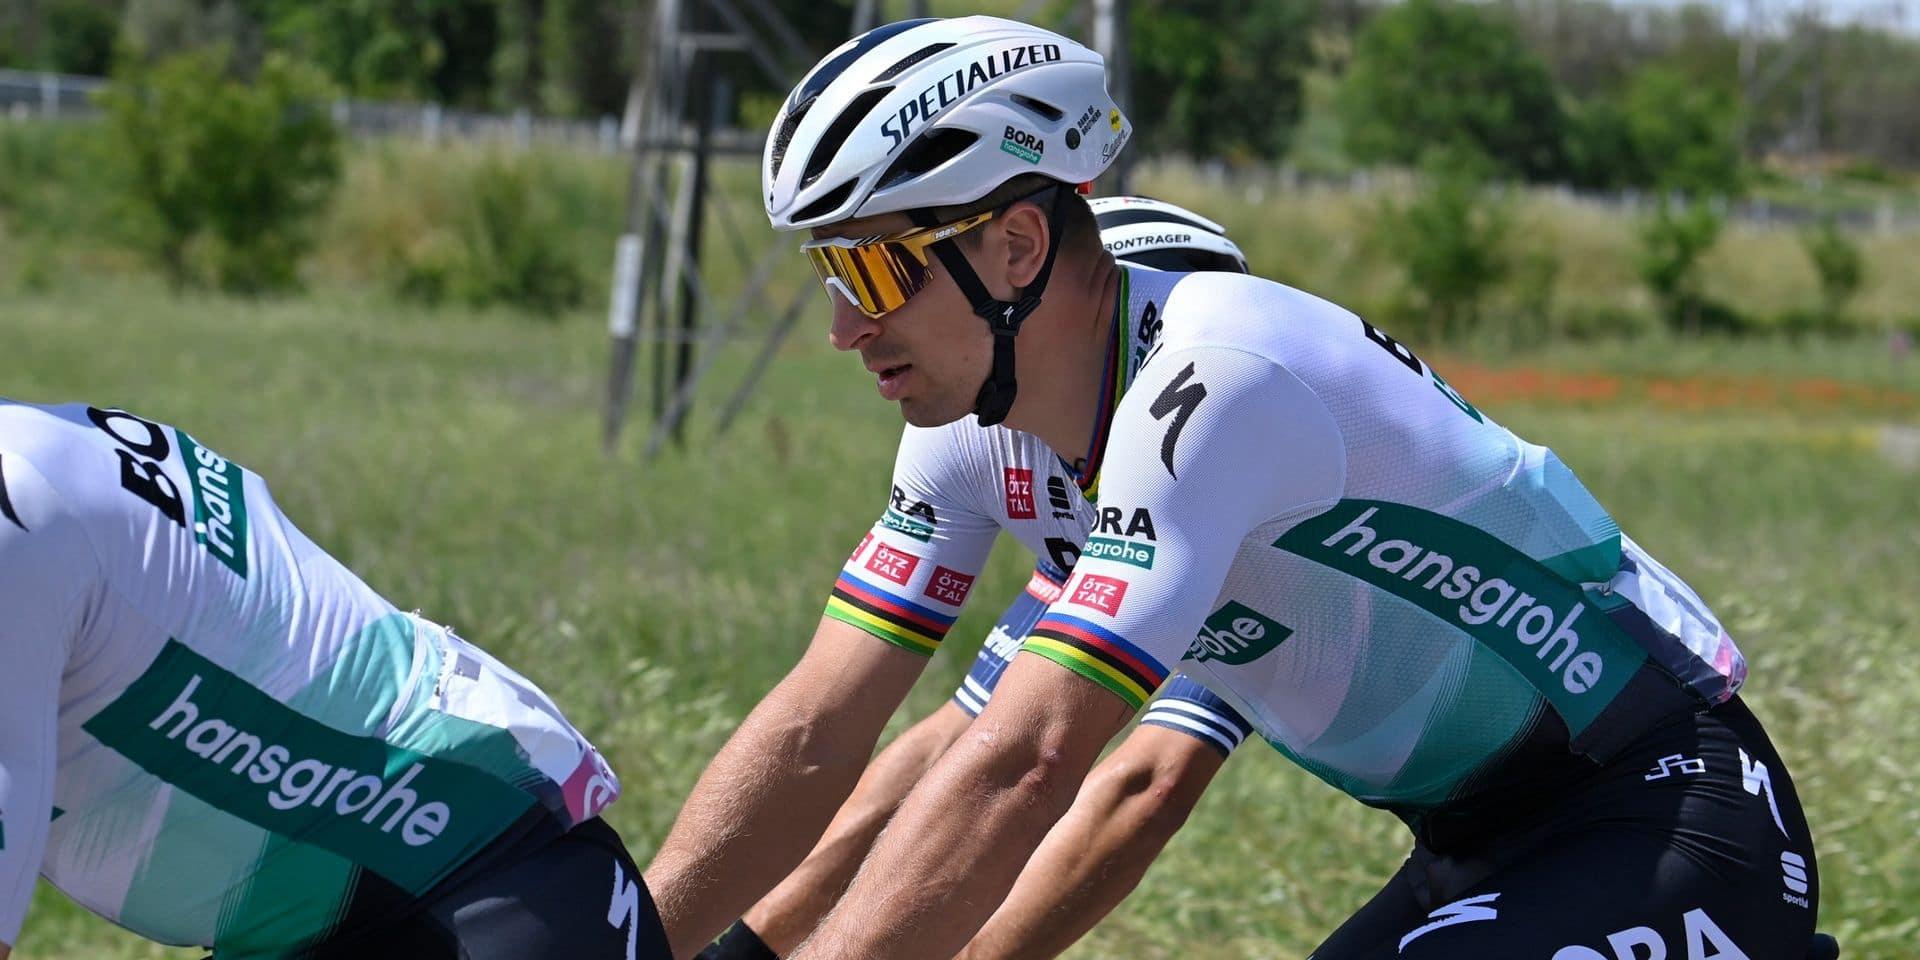 Giro : Sagan remporte la 10e étape au sprint, Evenepoel grappille une seconde à Bernal (VIDEO)